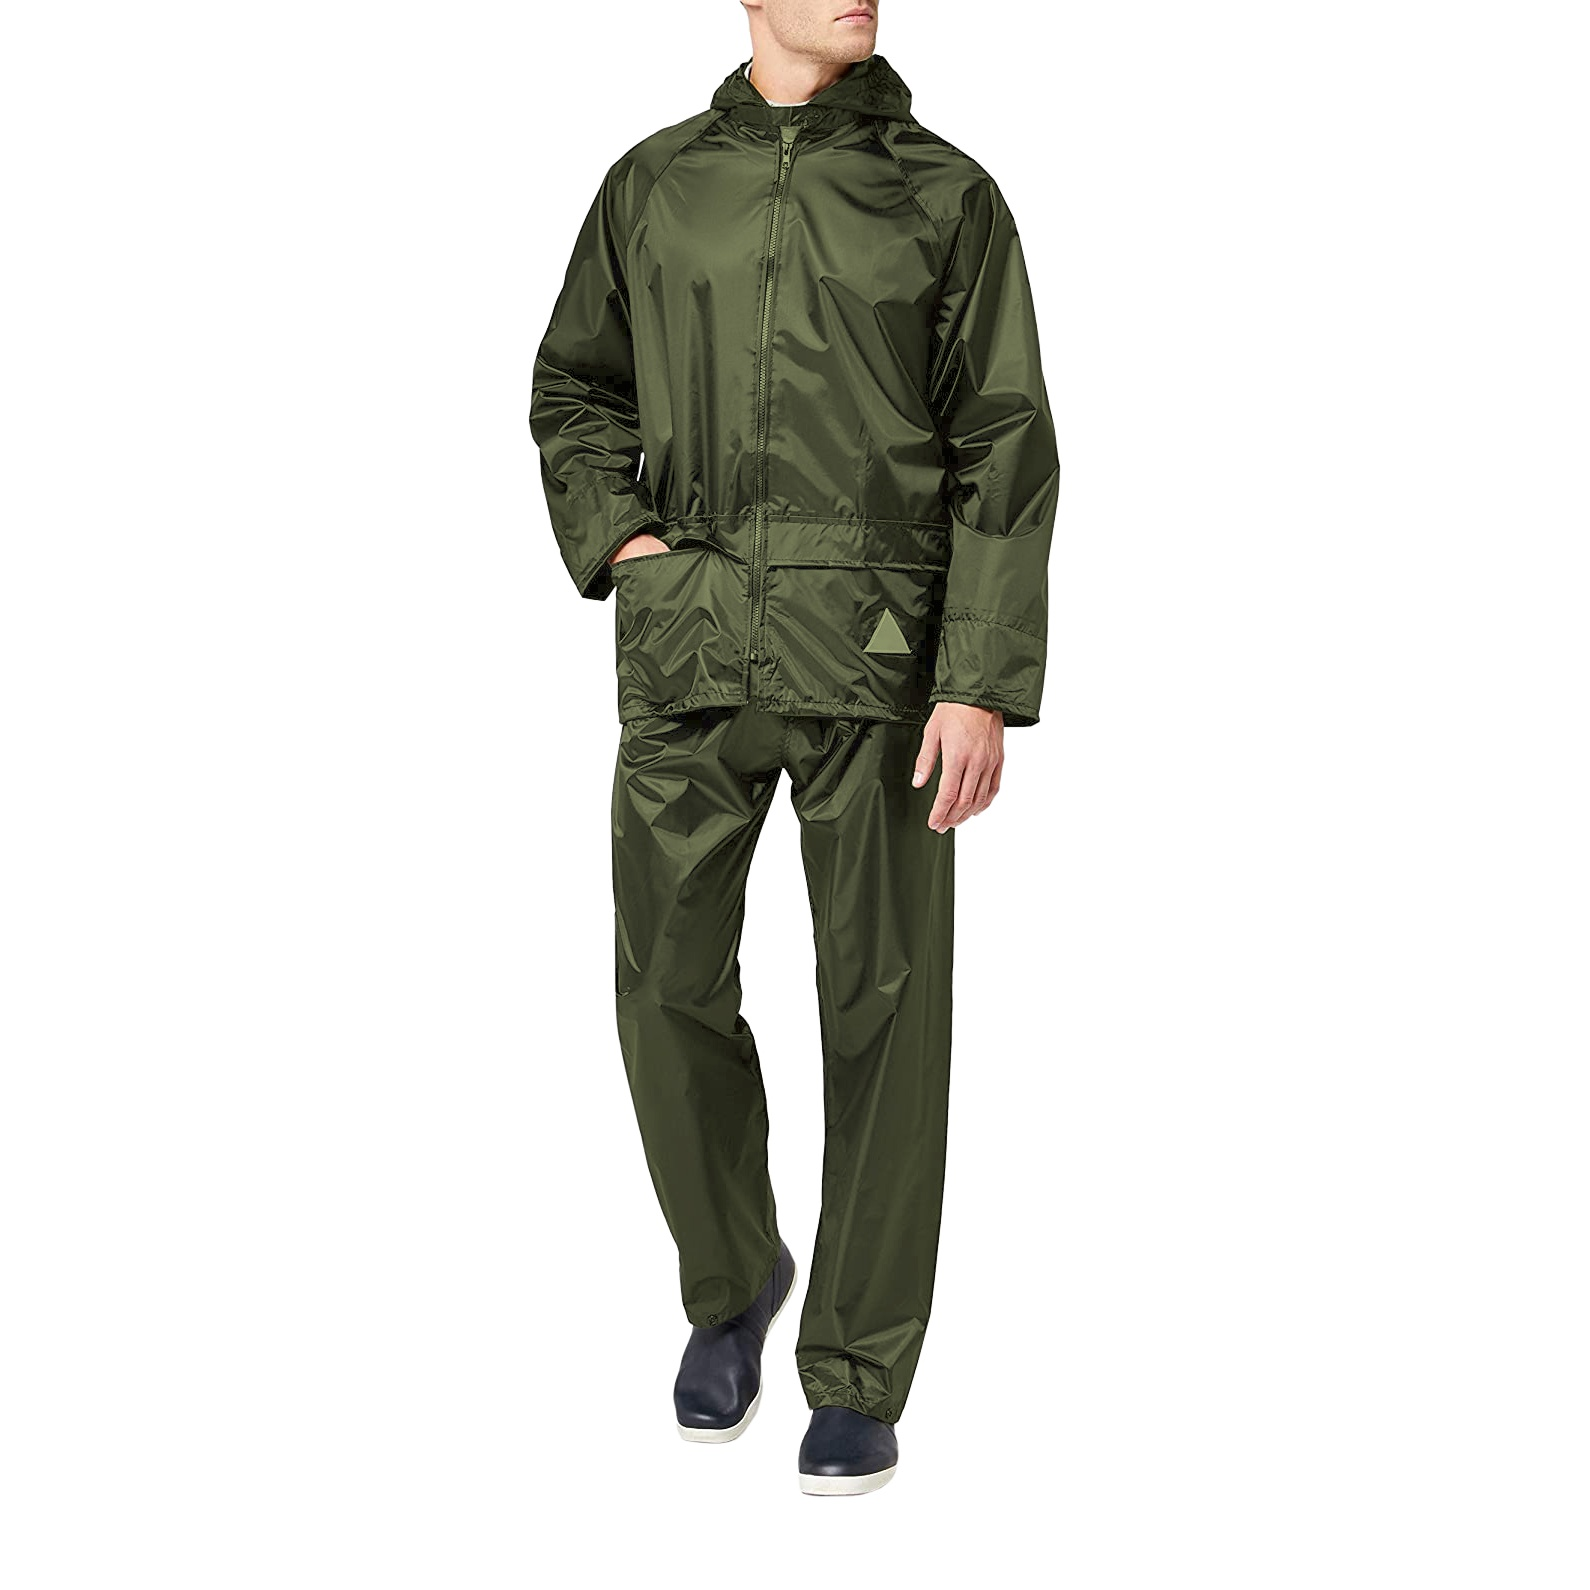 Result Mens Heavyweight Waterproof Rain Suit (Jacket & Trouser Suit) (L) (Royal)